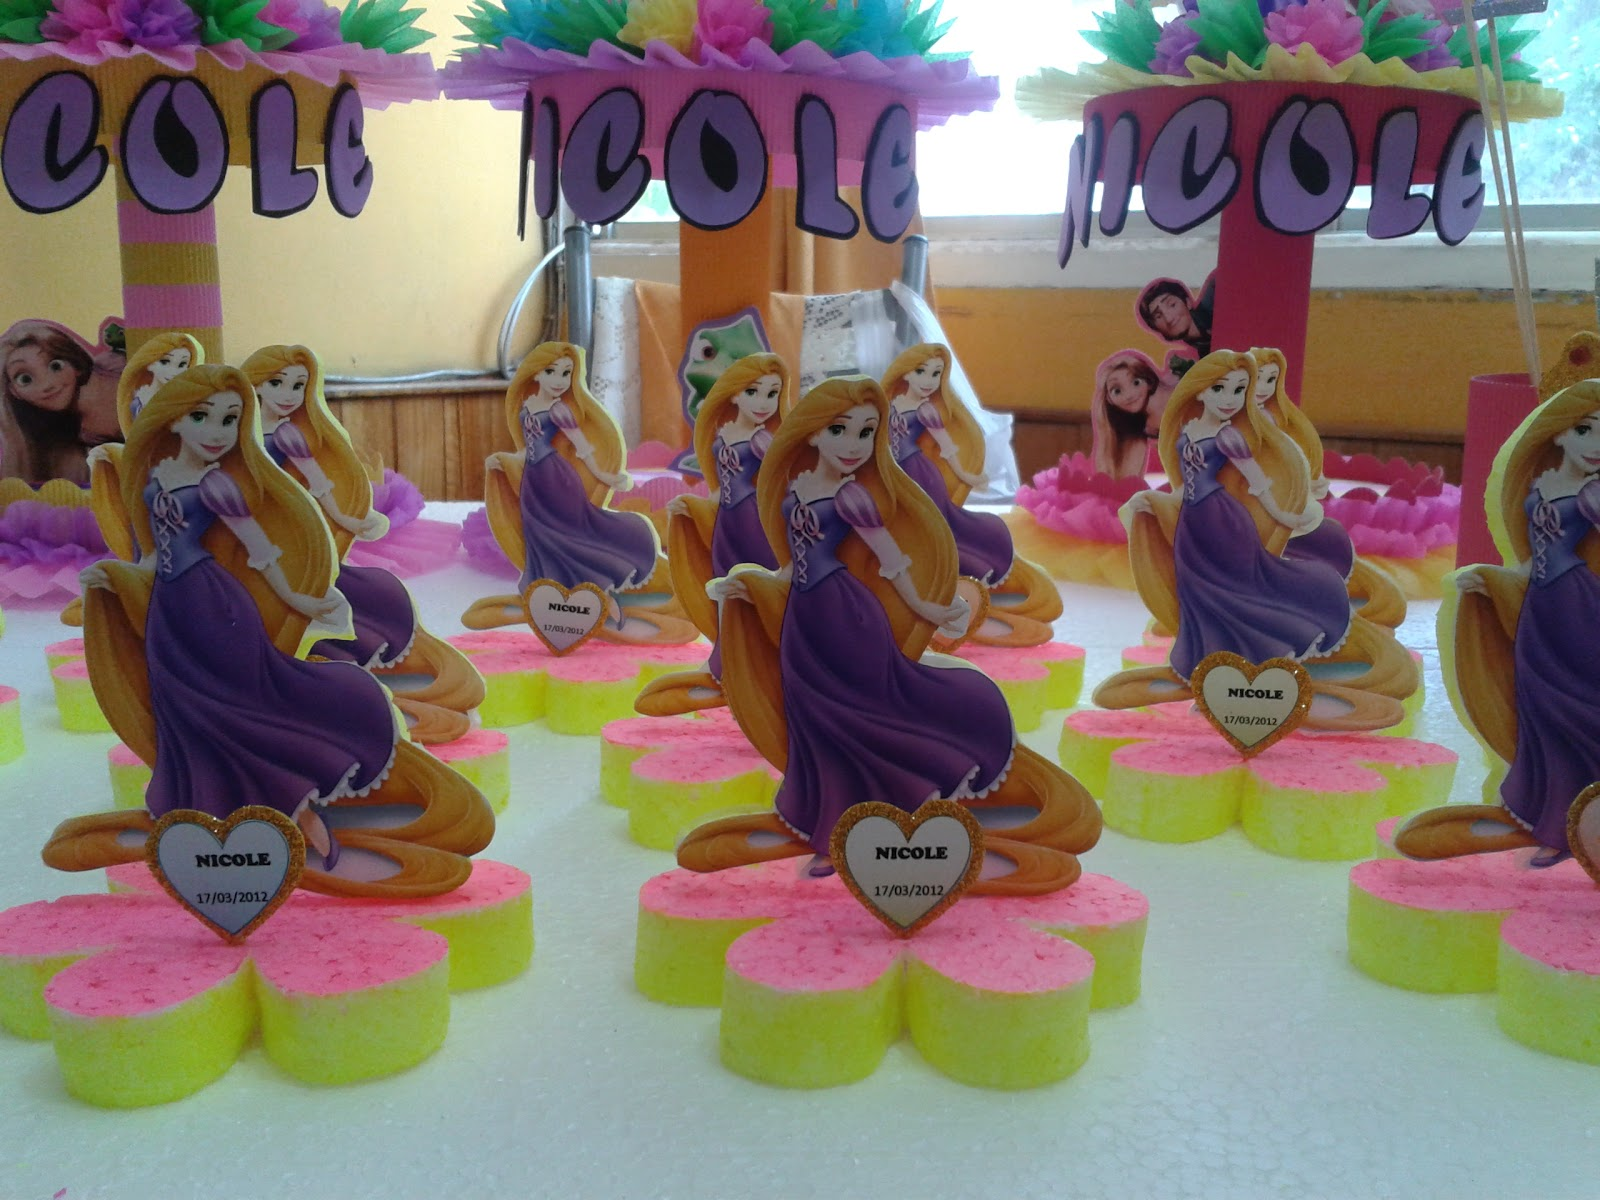 Decoracion De Rapunzel Para Fiestas Infantiles ~ Decoraci?n para fiestas infantiles de rapunzel  Imagui